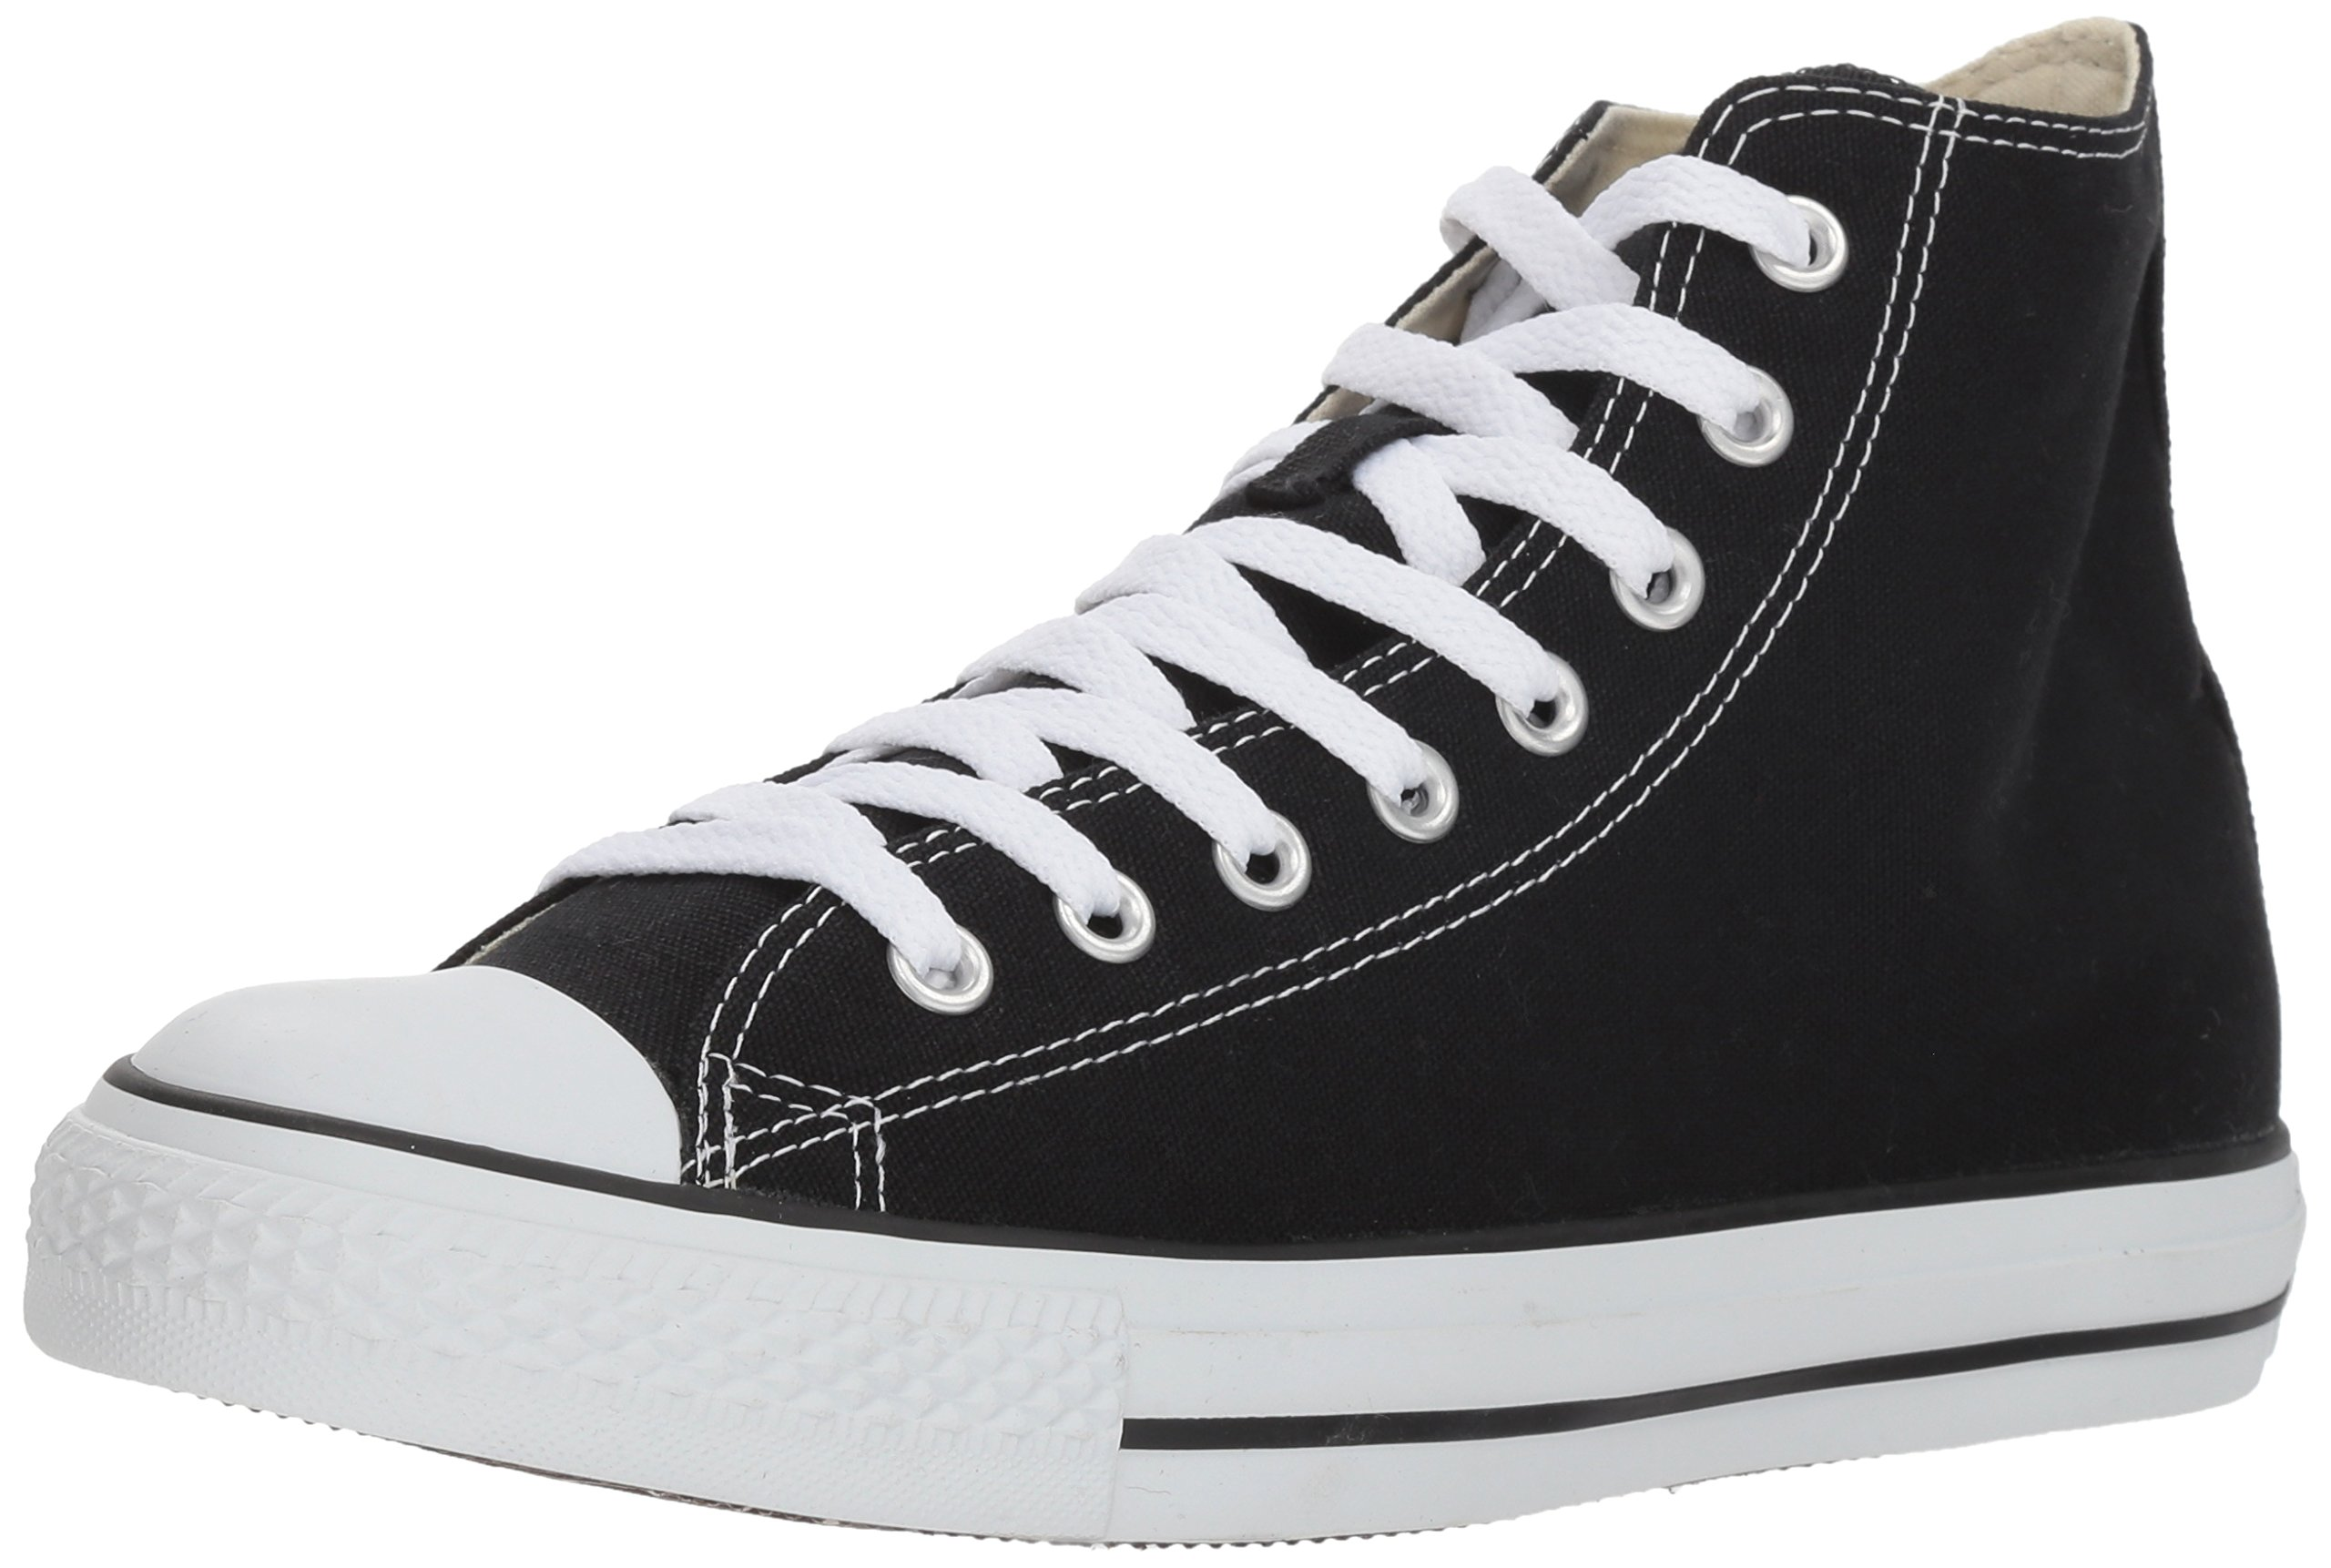 Converse Chuck Taylor All Star High Top Shoe, Black, 10 M US